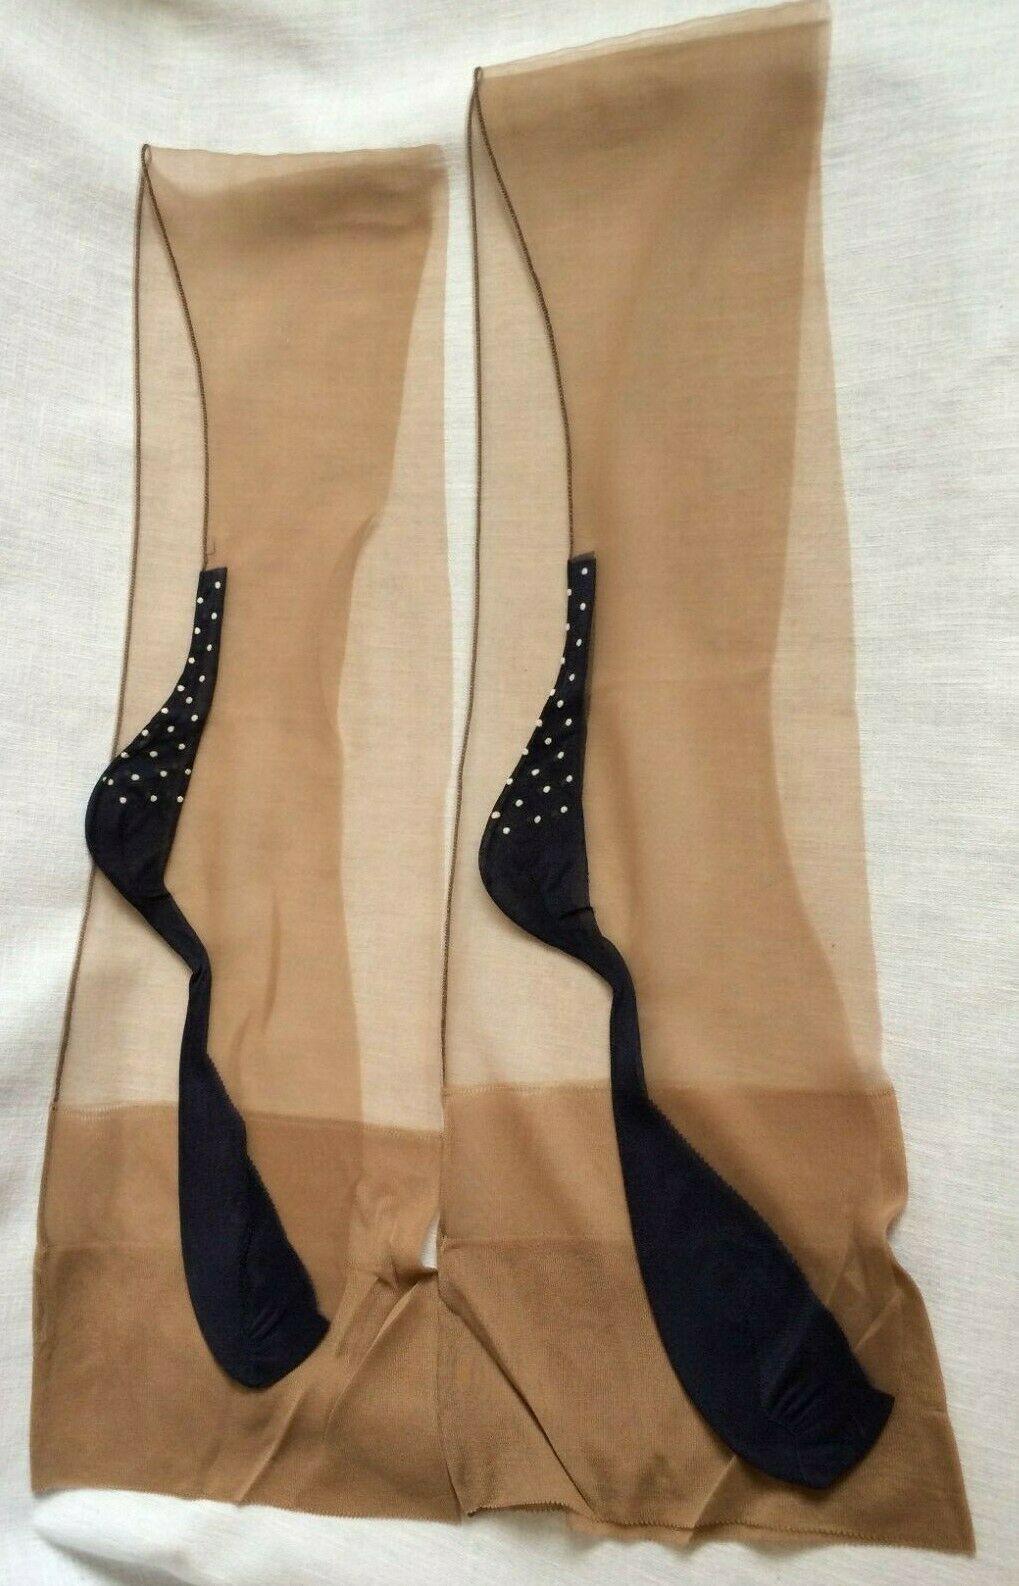 Nancies Fully Fashioned Cuban Heel Stockings